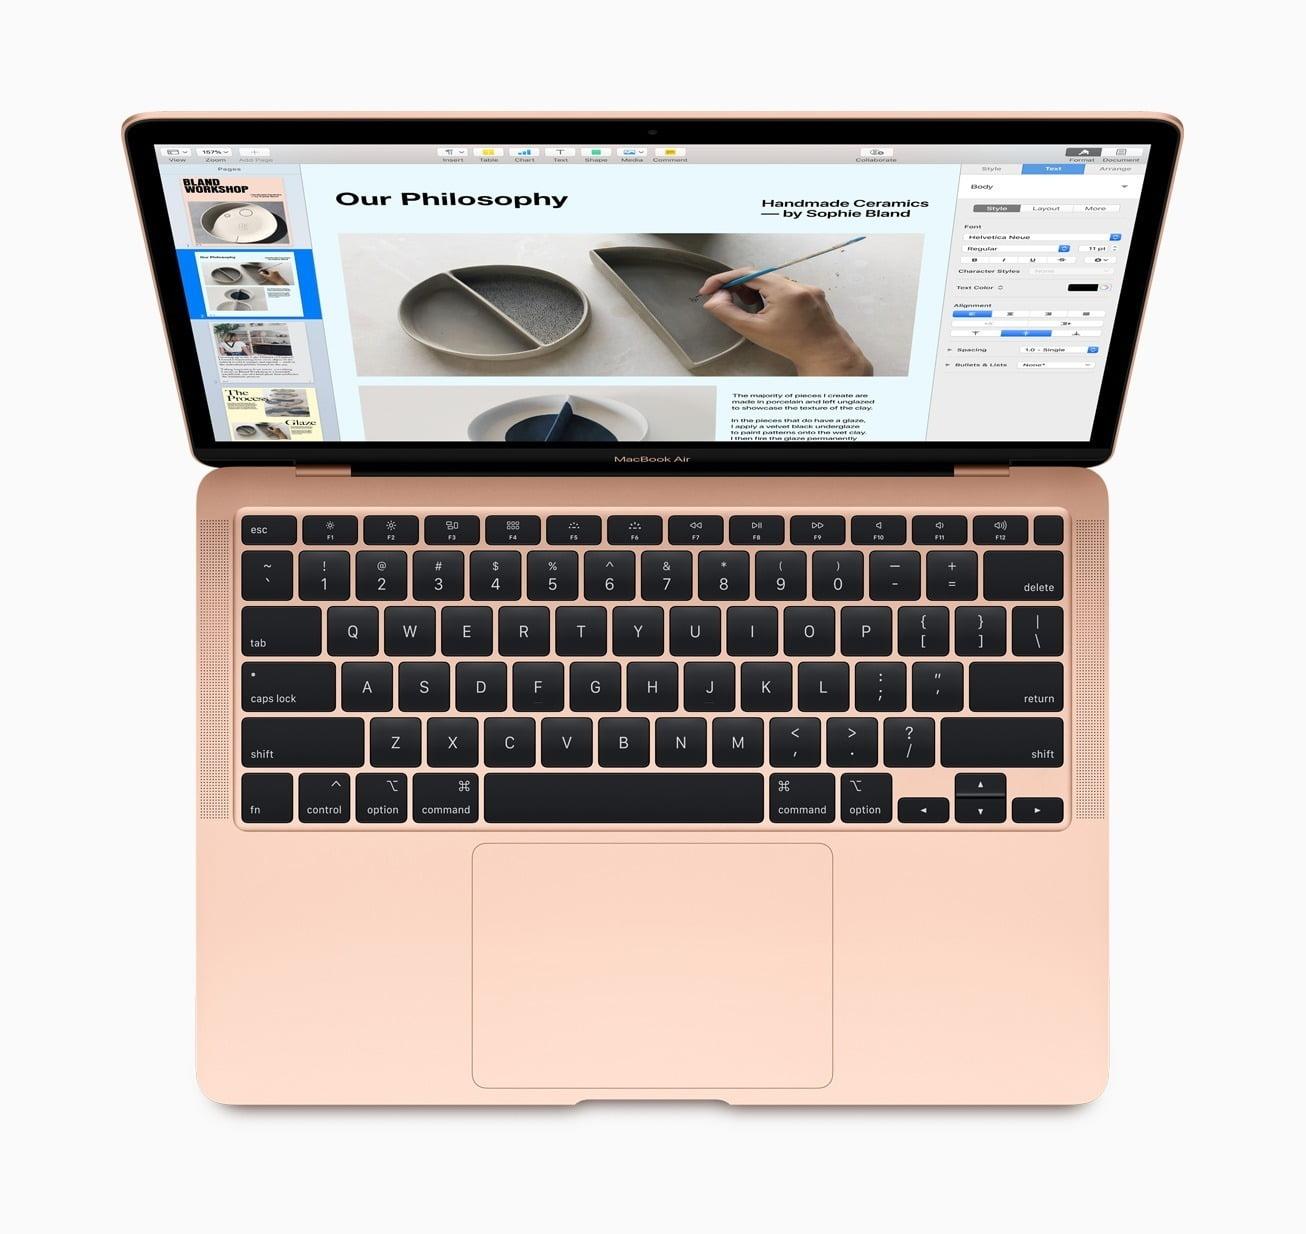 Macbook Air 2020 Magic Keyboard